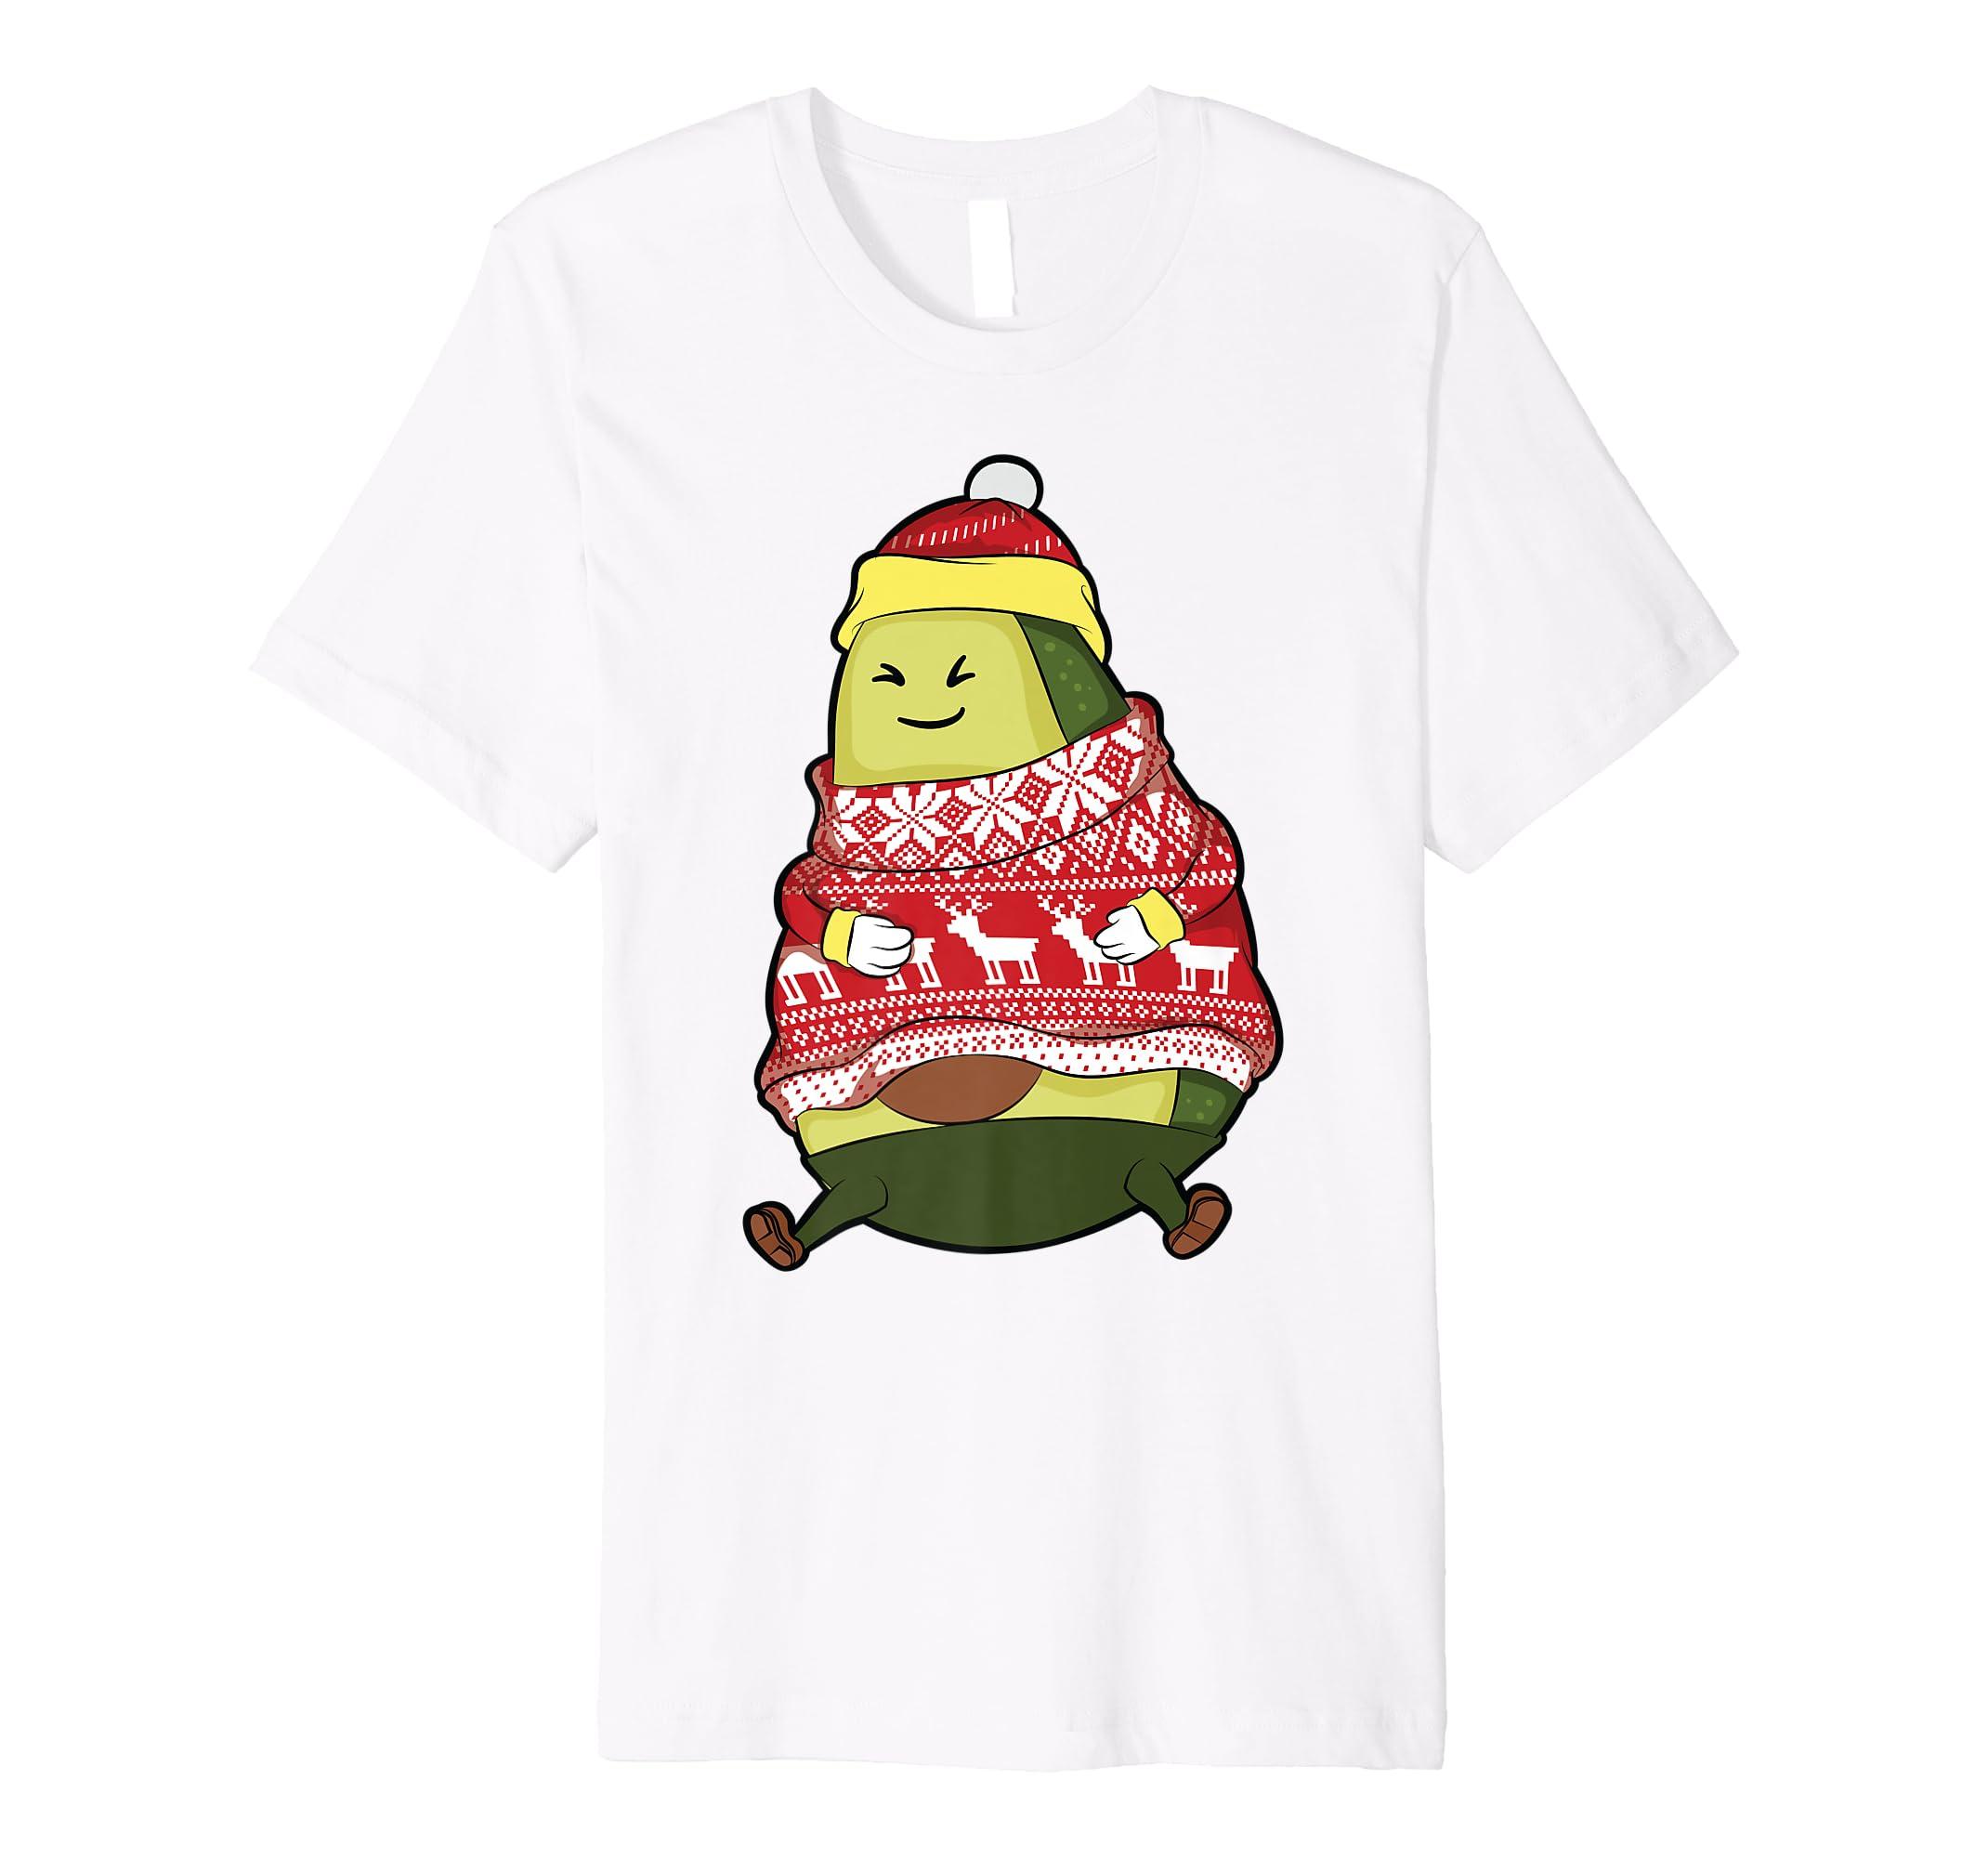 8a96aa93c1ccb Amazon.com  Avocado Ugly Christmas Sweater Shirt